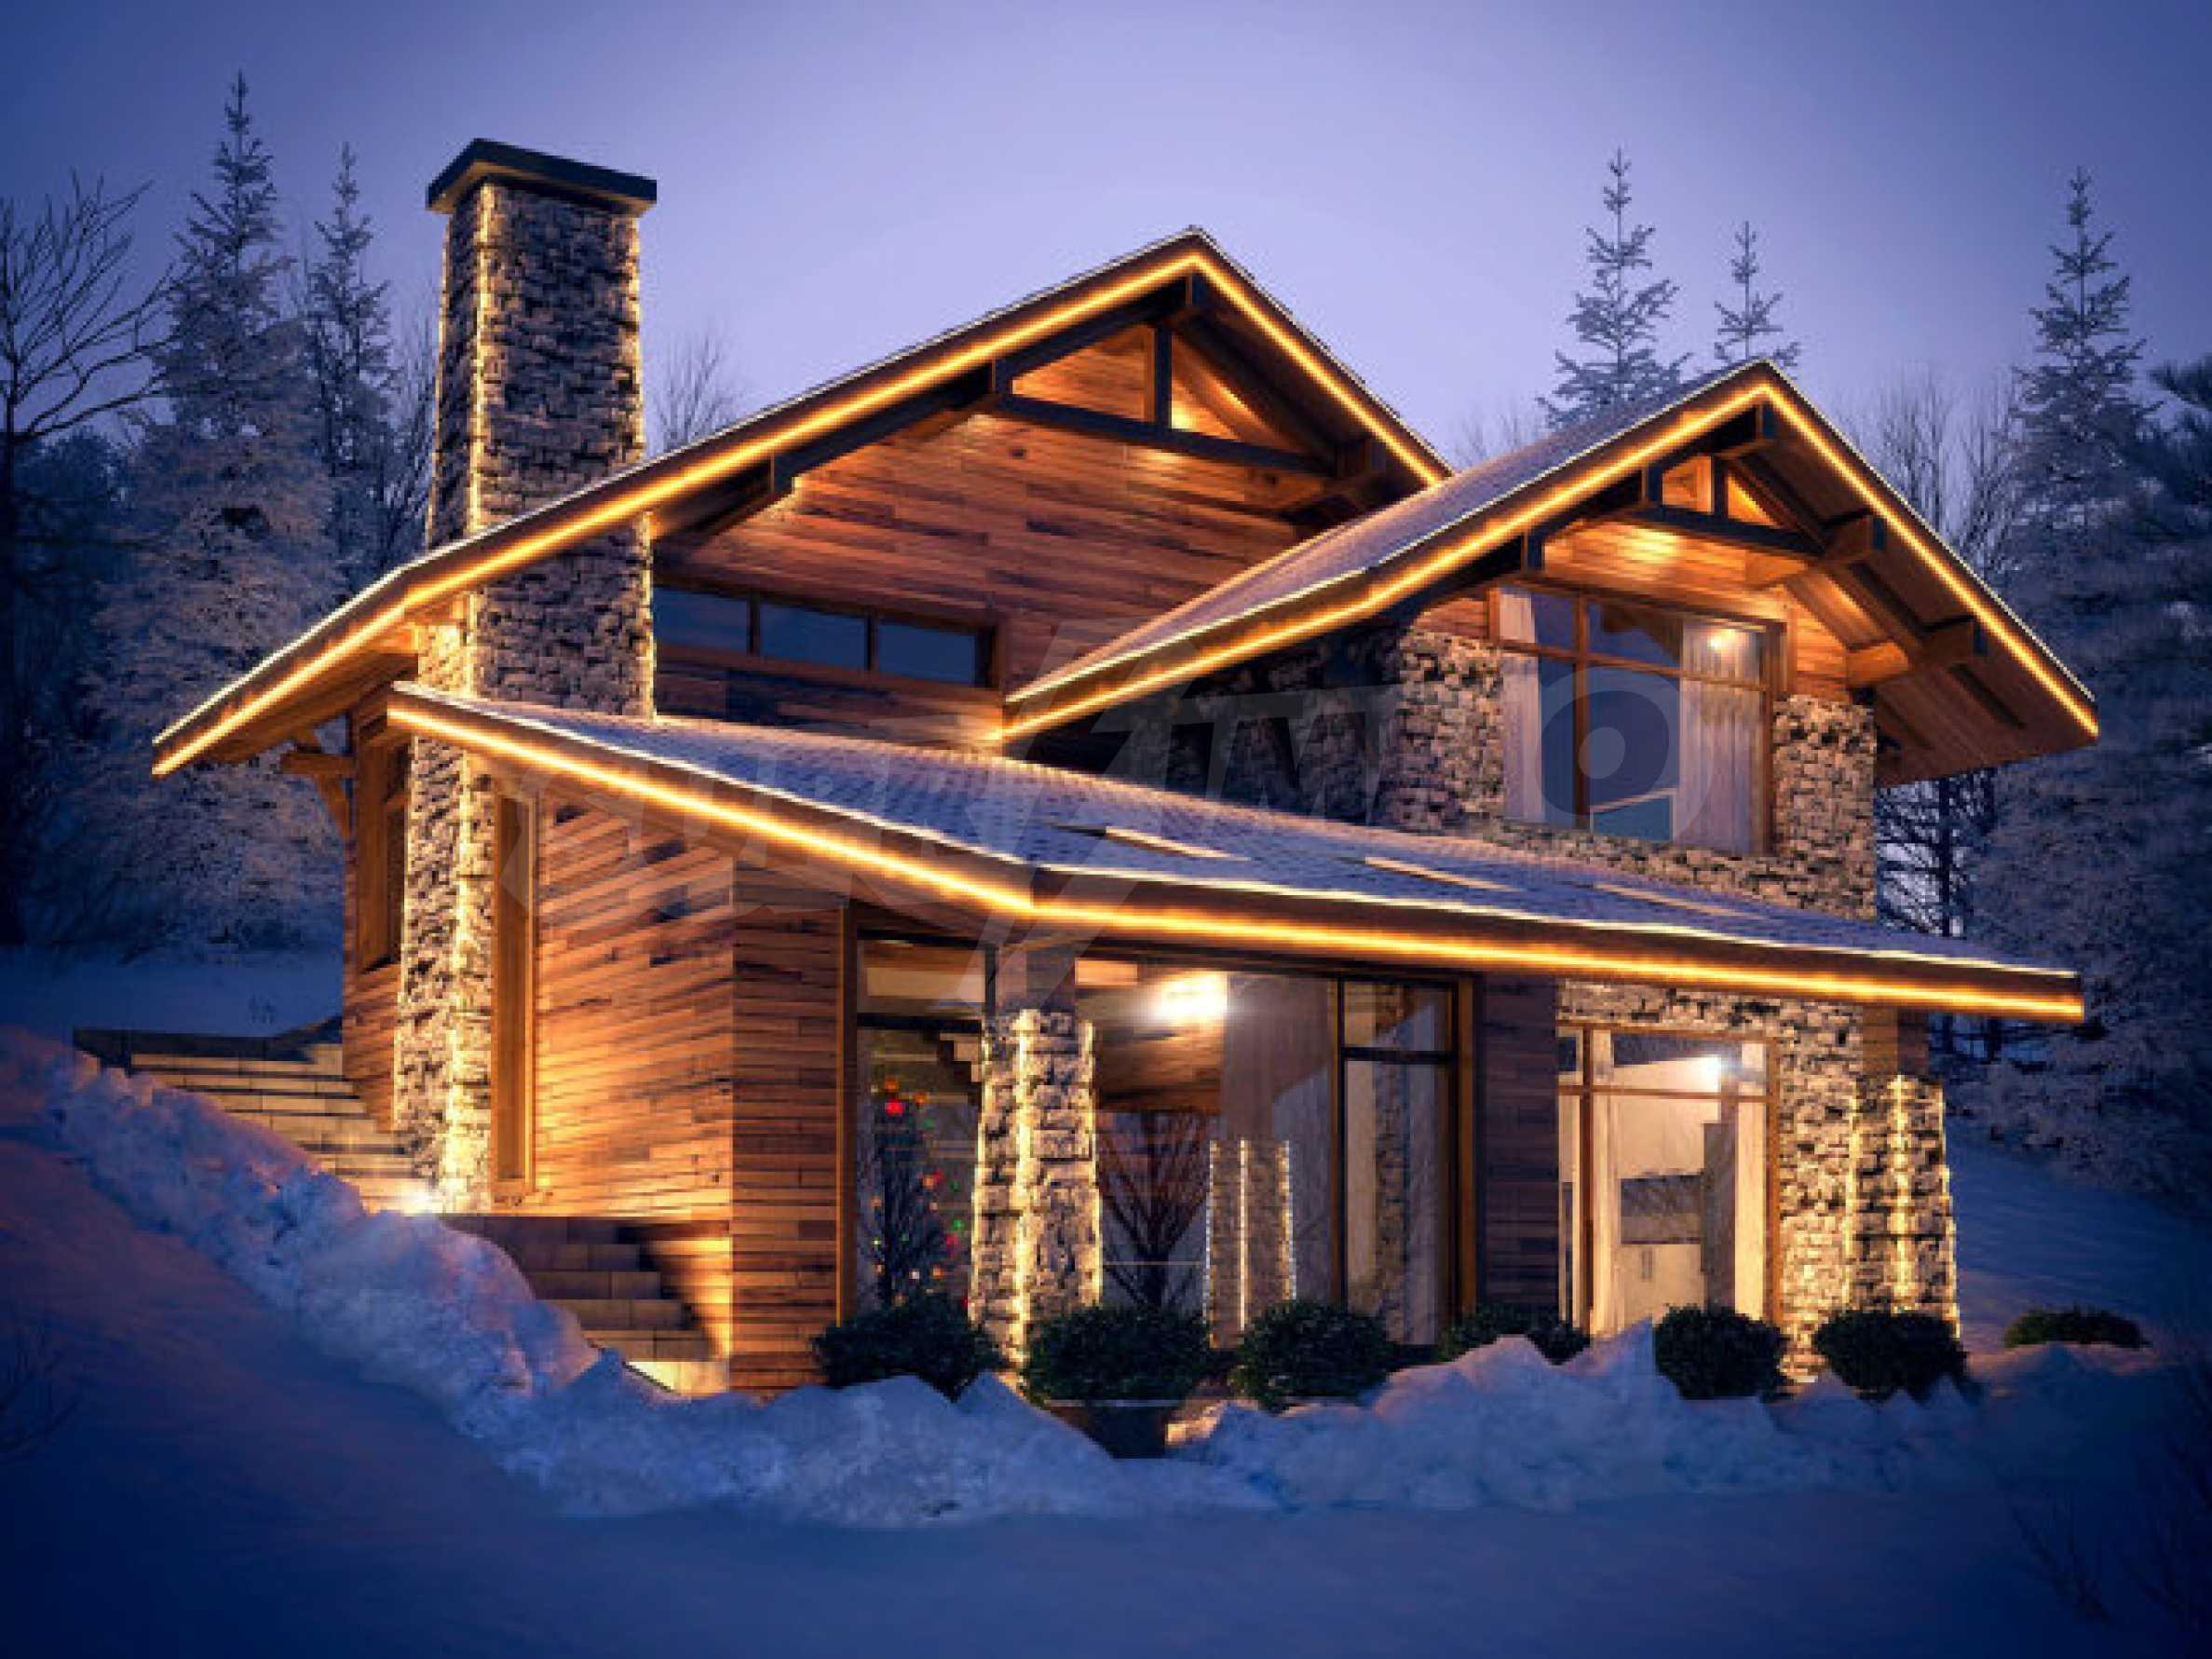 New Villas With Uniqie Views In Clean Region 14 Km Away From The Ski Runs Of Bansko